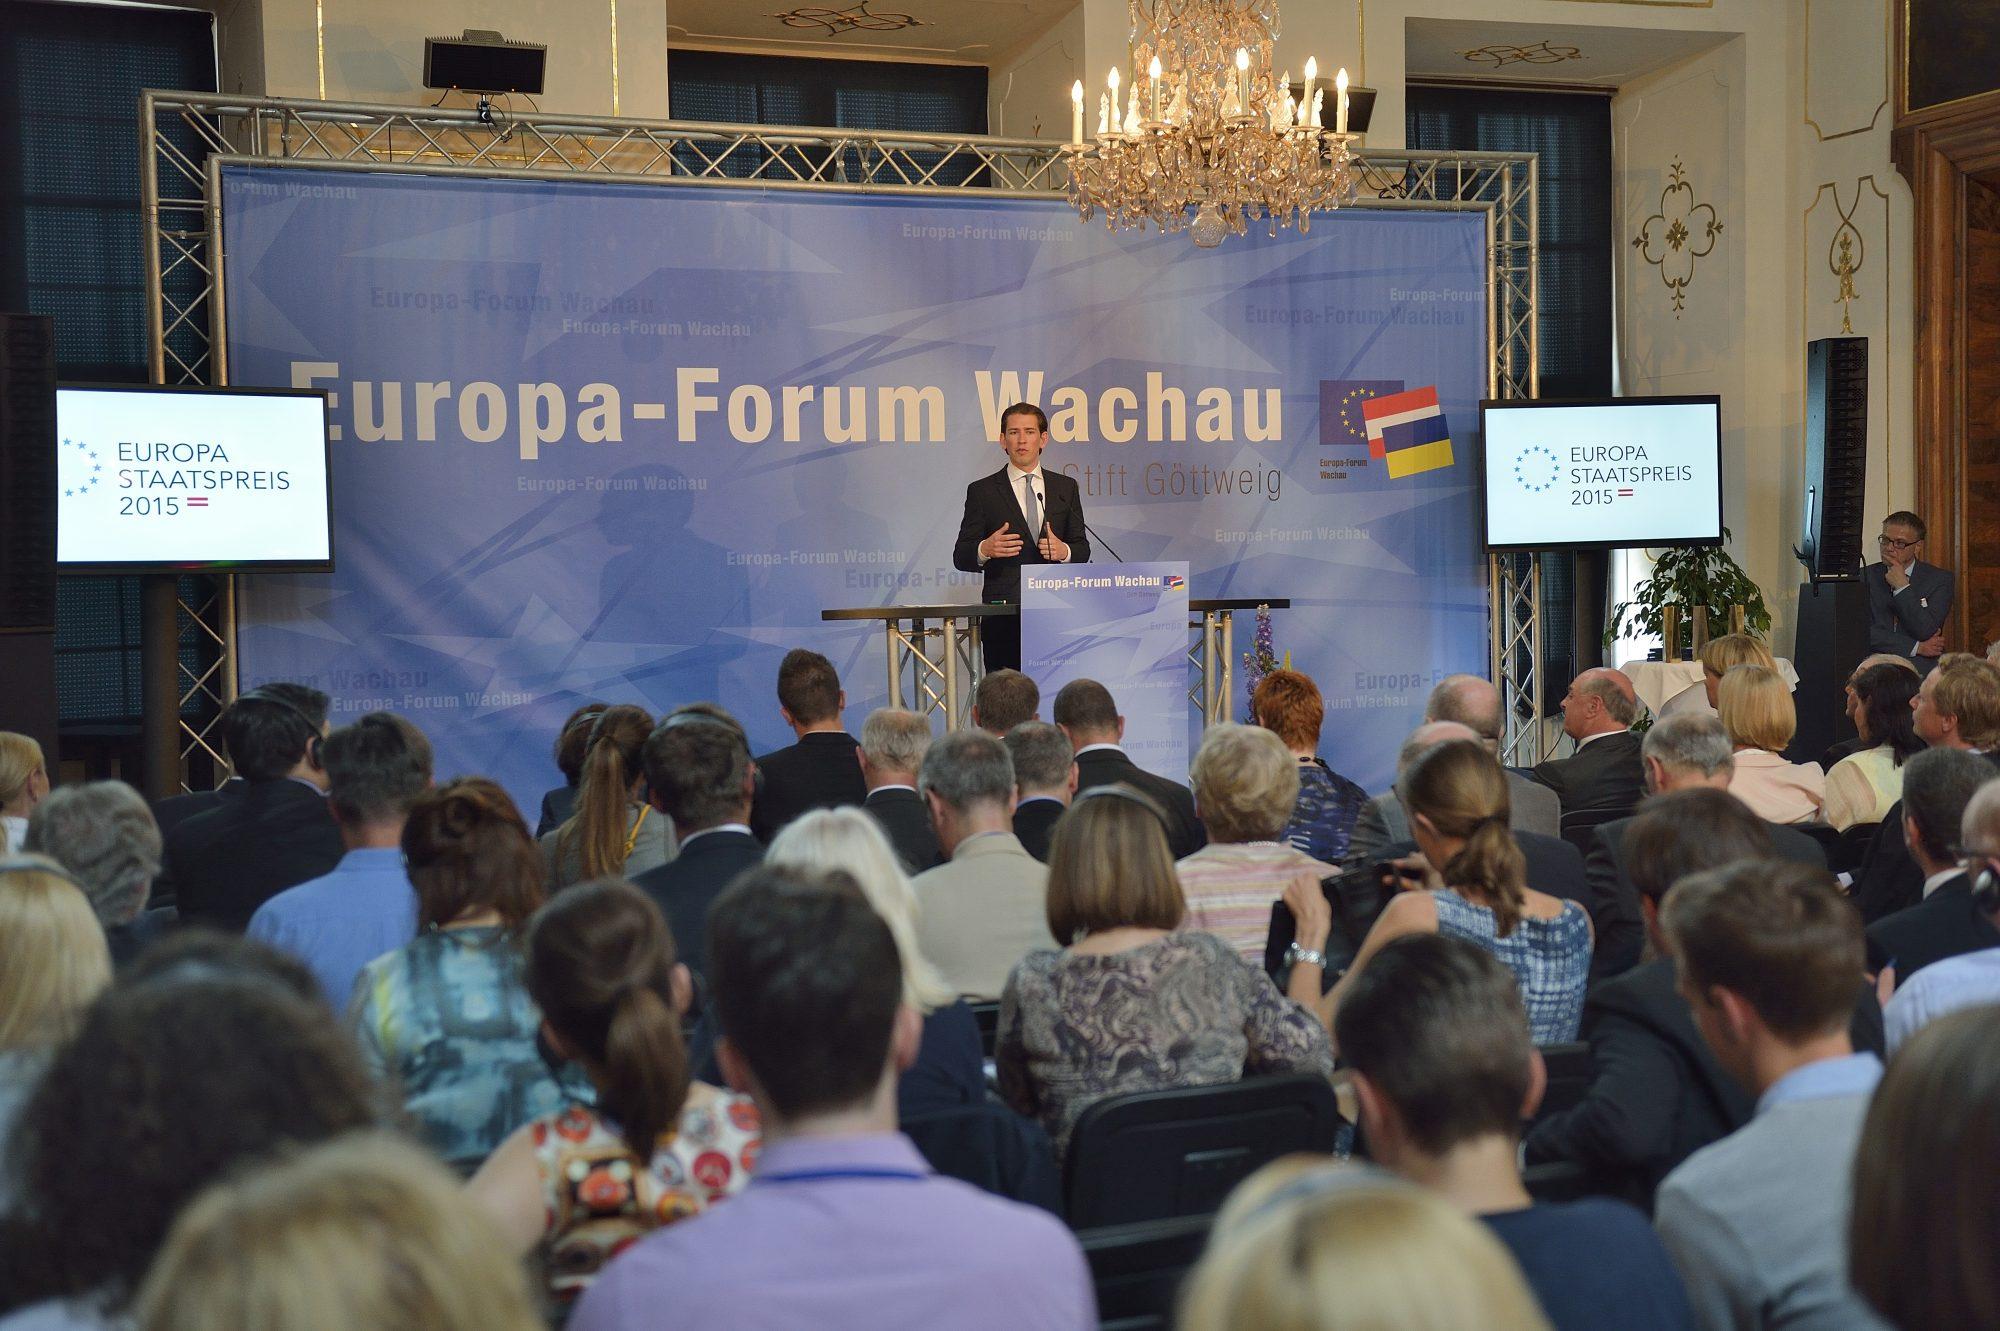 Europa-Forum Wachau 2015